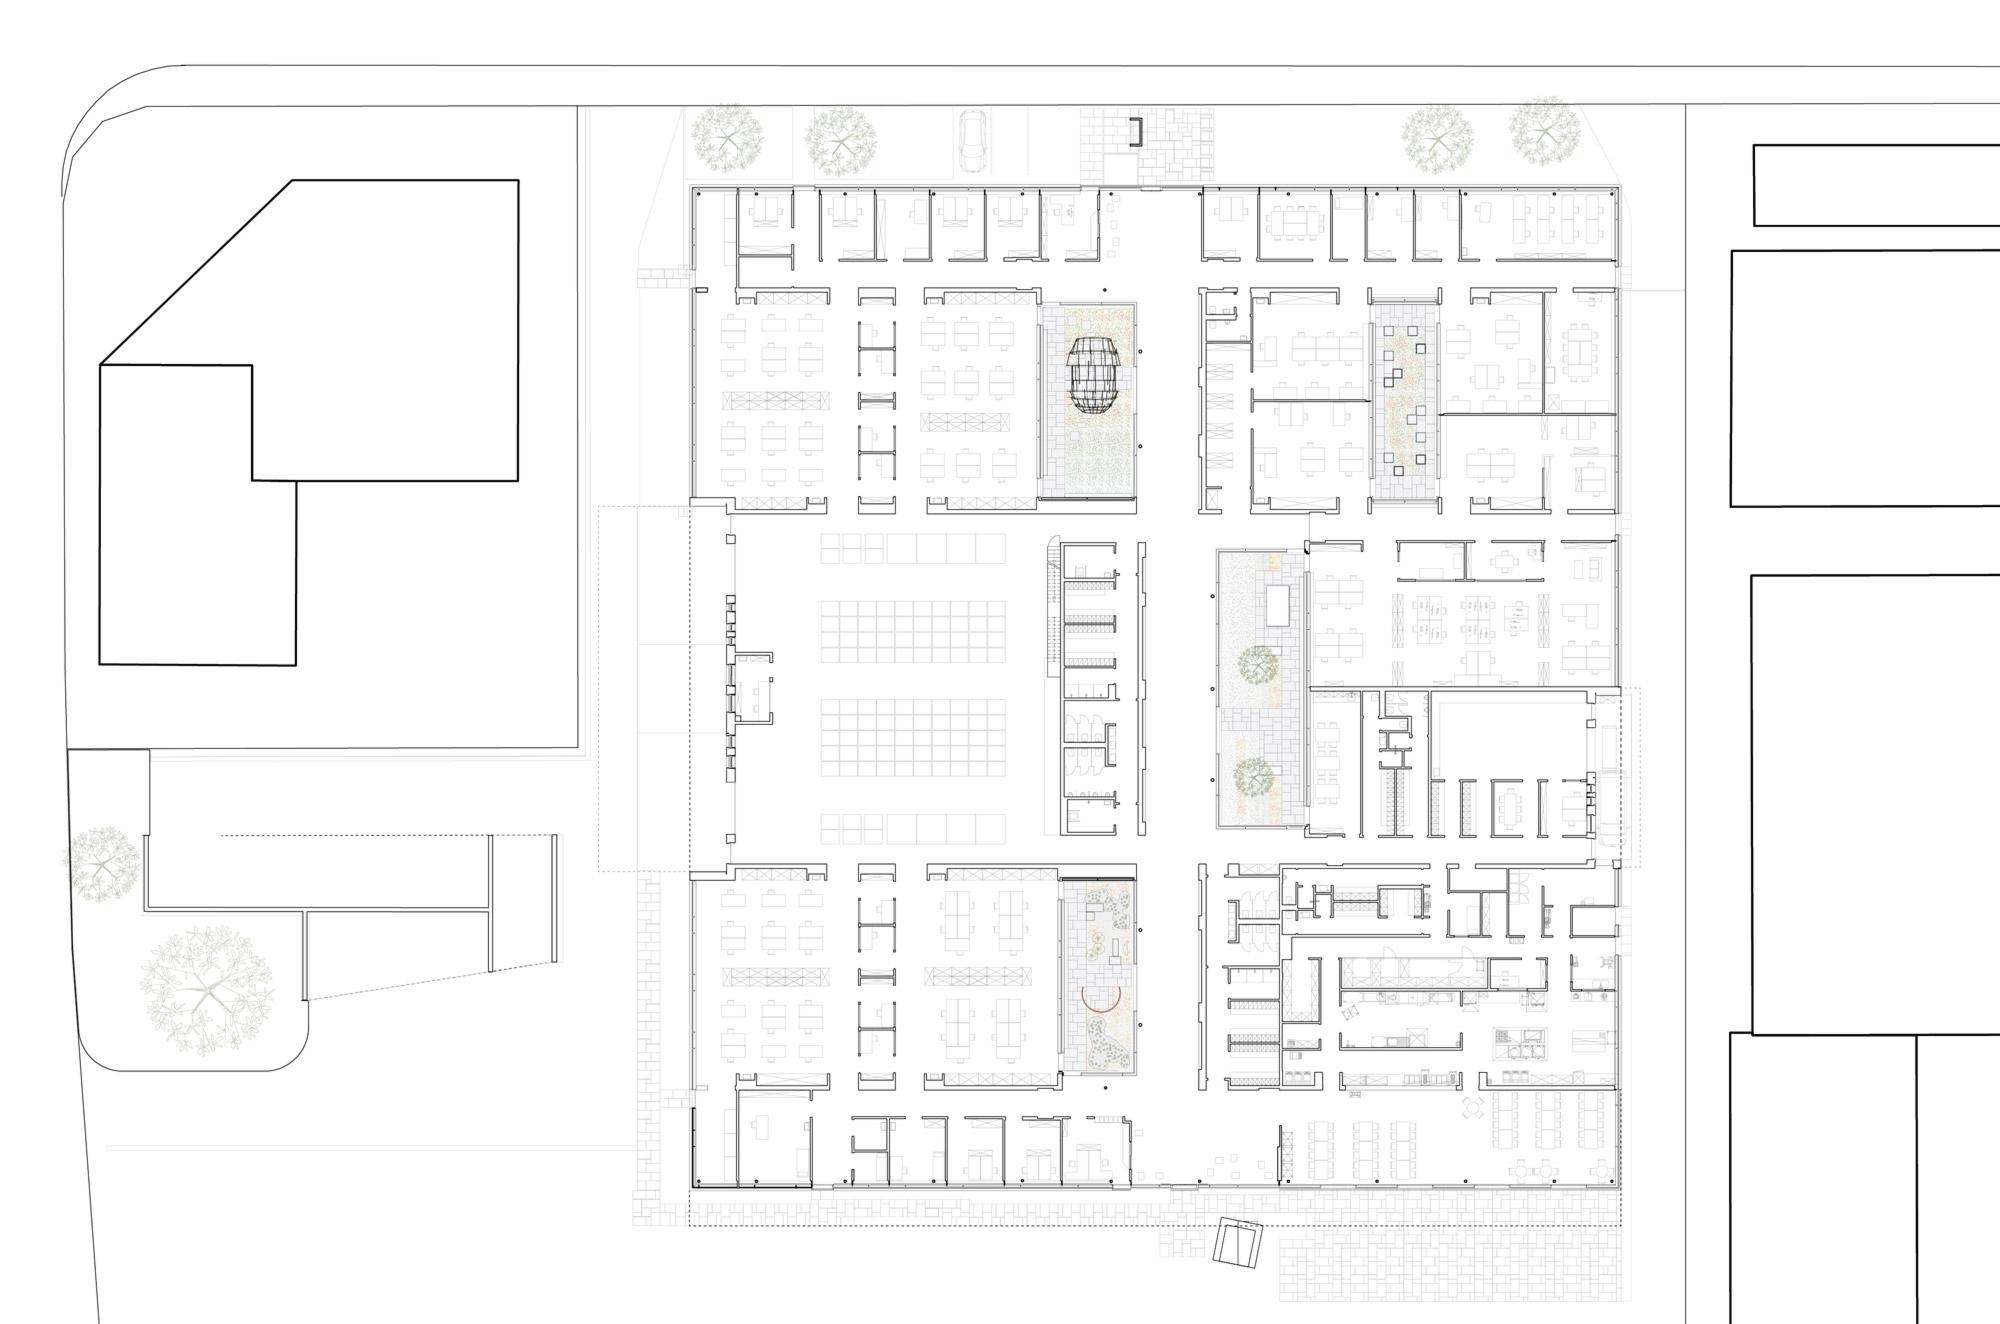 2000_Grundriss-Gebäude_